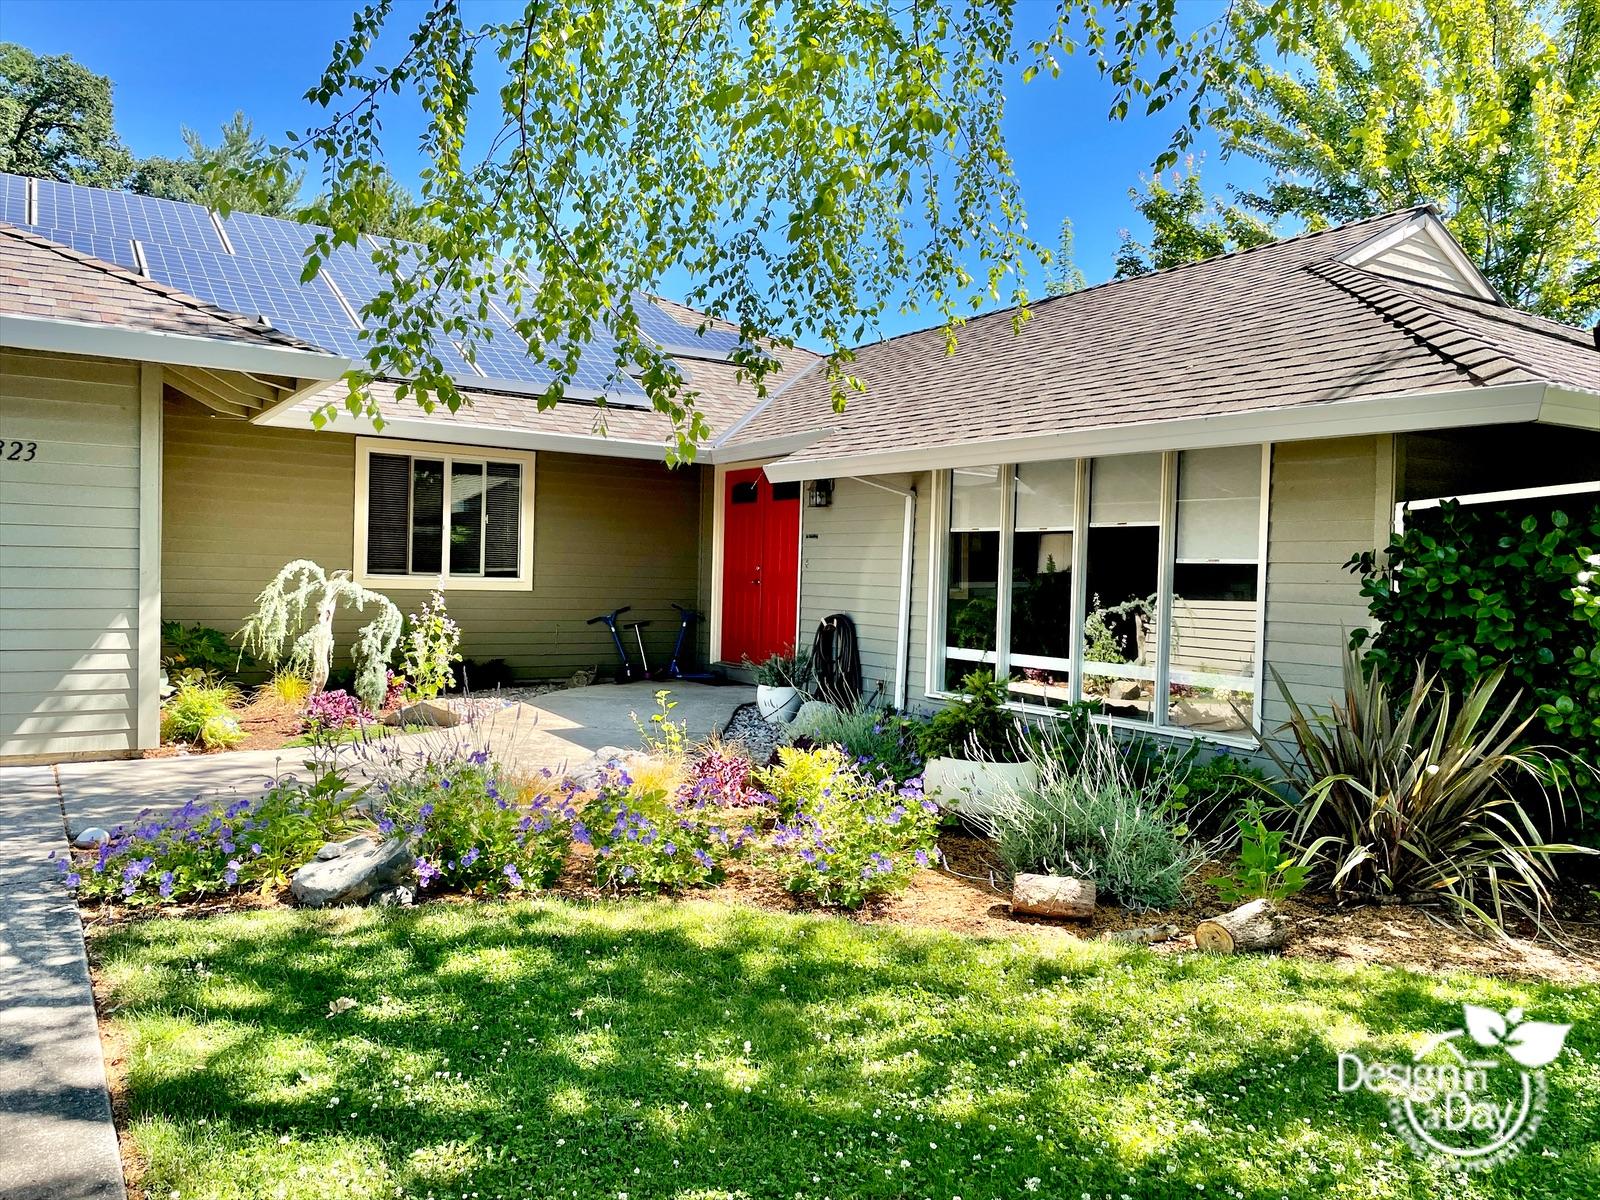 After landscape design photo shows summer plantings and color in front yard Portland Oregon